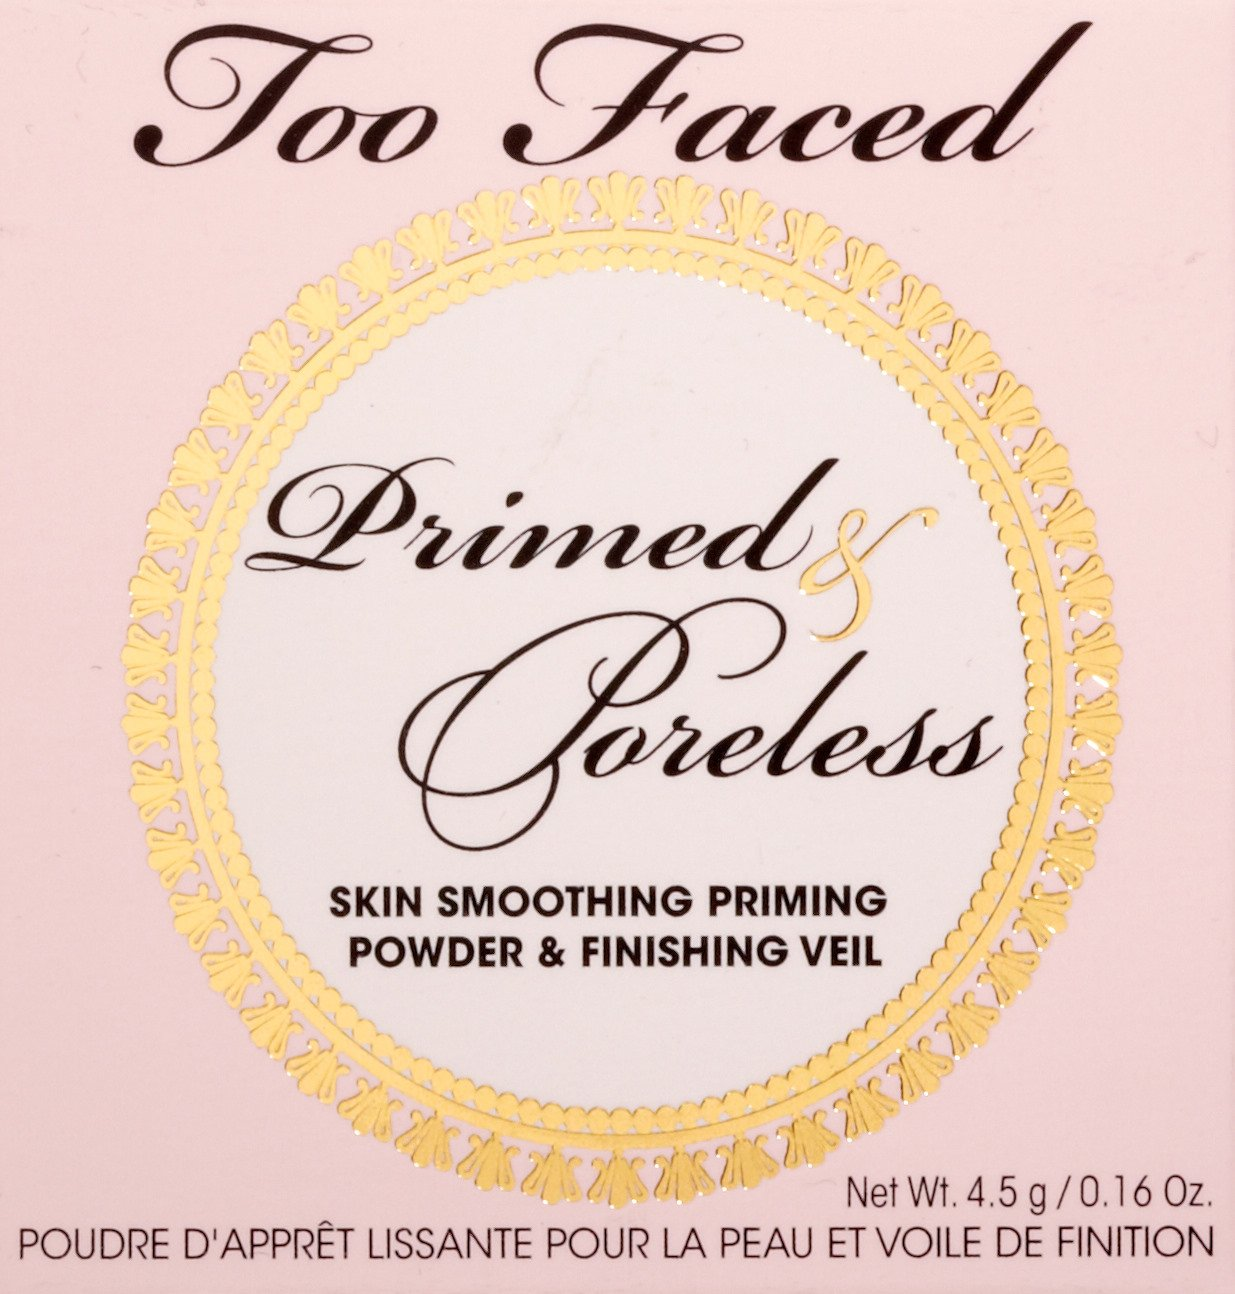 Too Faced Cosmetics Primed and Poreless Powder, 0.16 Ounce